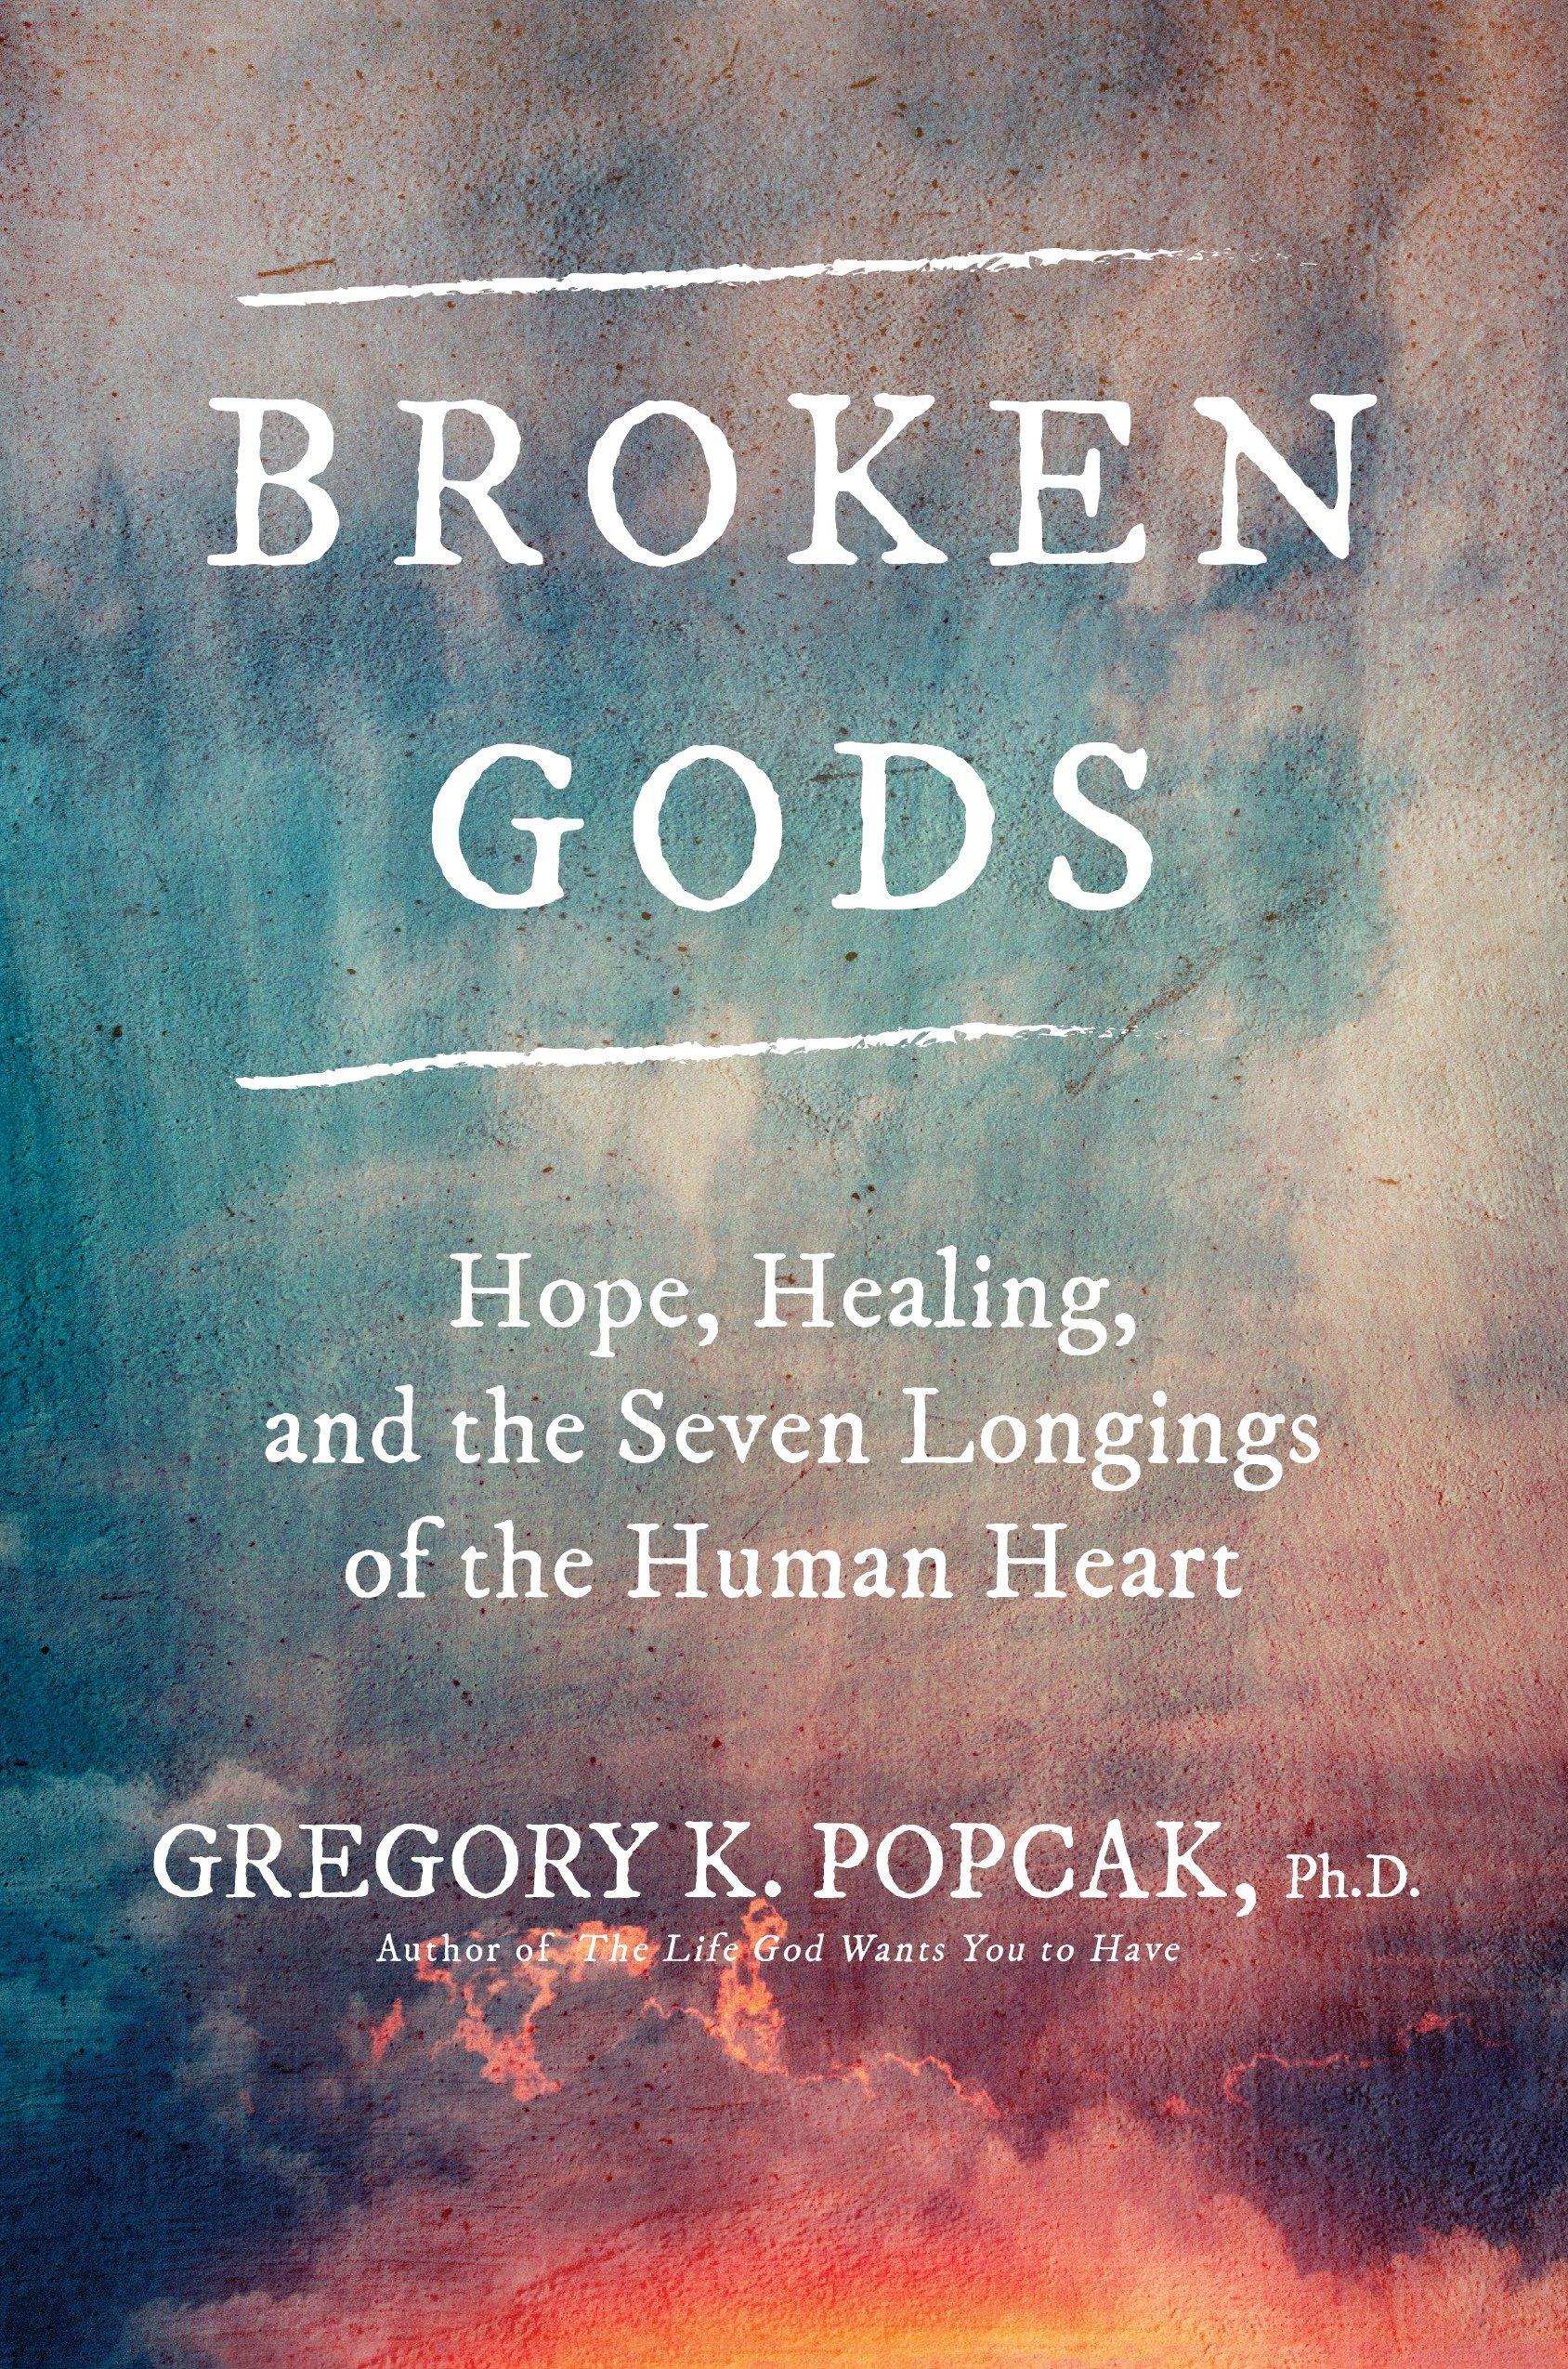 Broken Gods: Hope, Healing, and the Seven Longings of the Human Heart: Dr.  Greg K. Popcak Ph.D.: 0884625330953: Amazon.com: Books